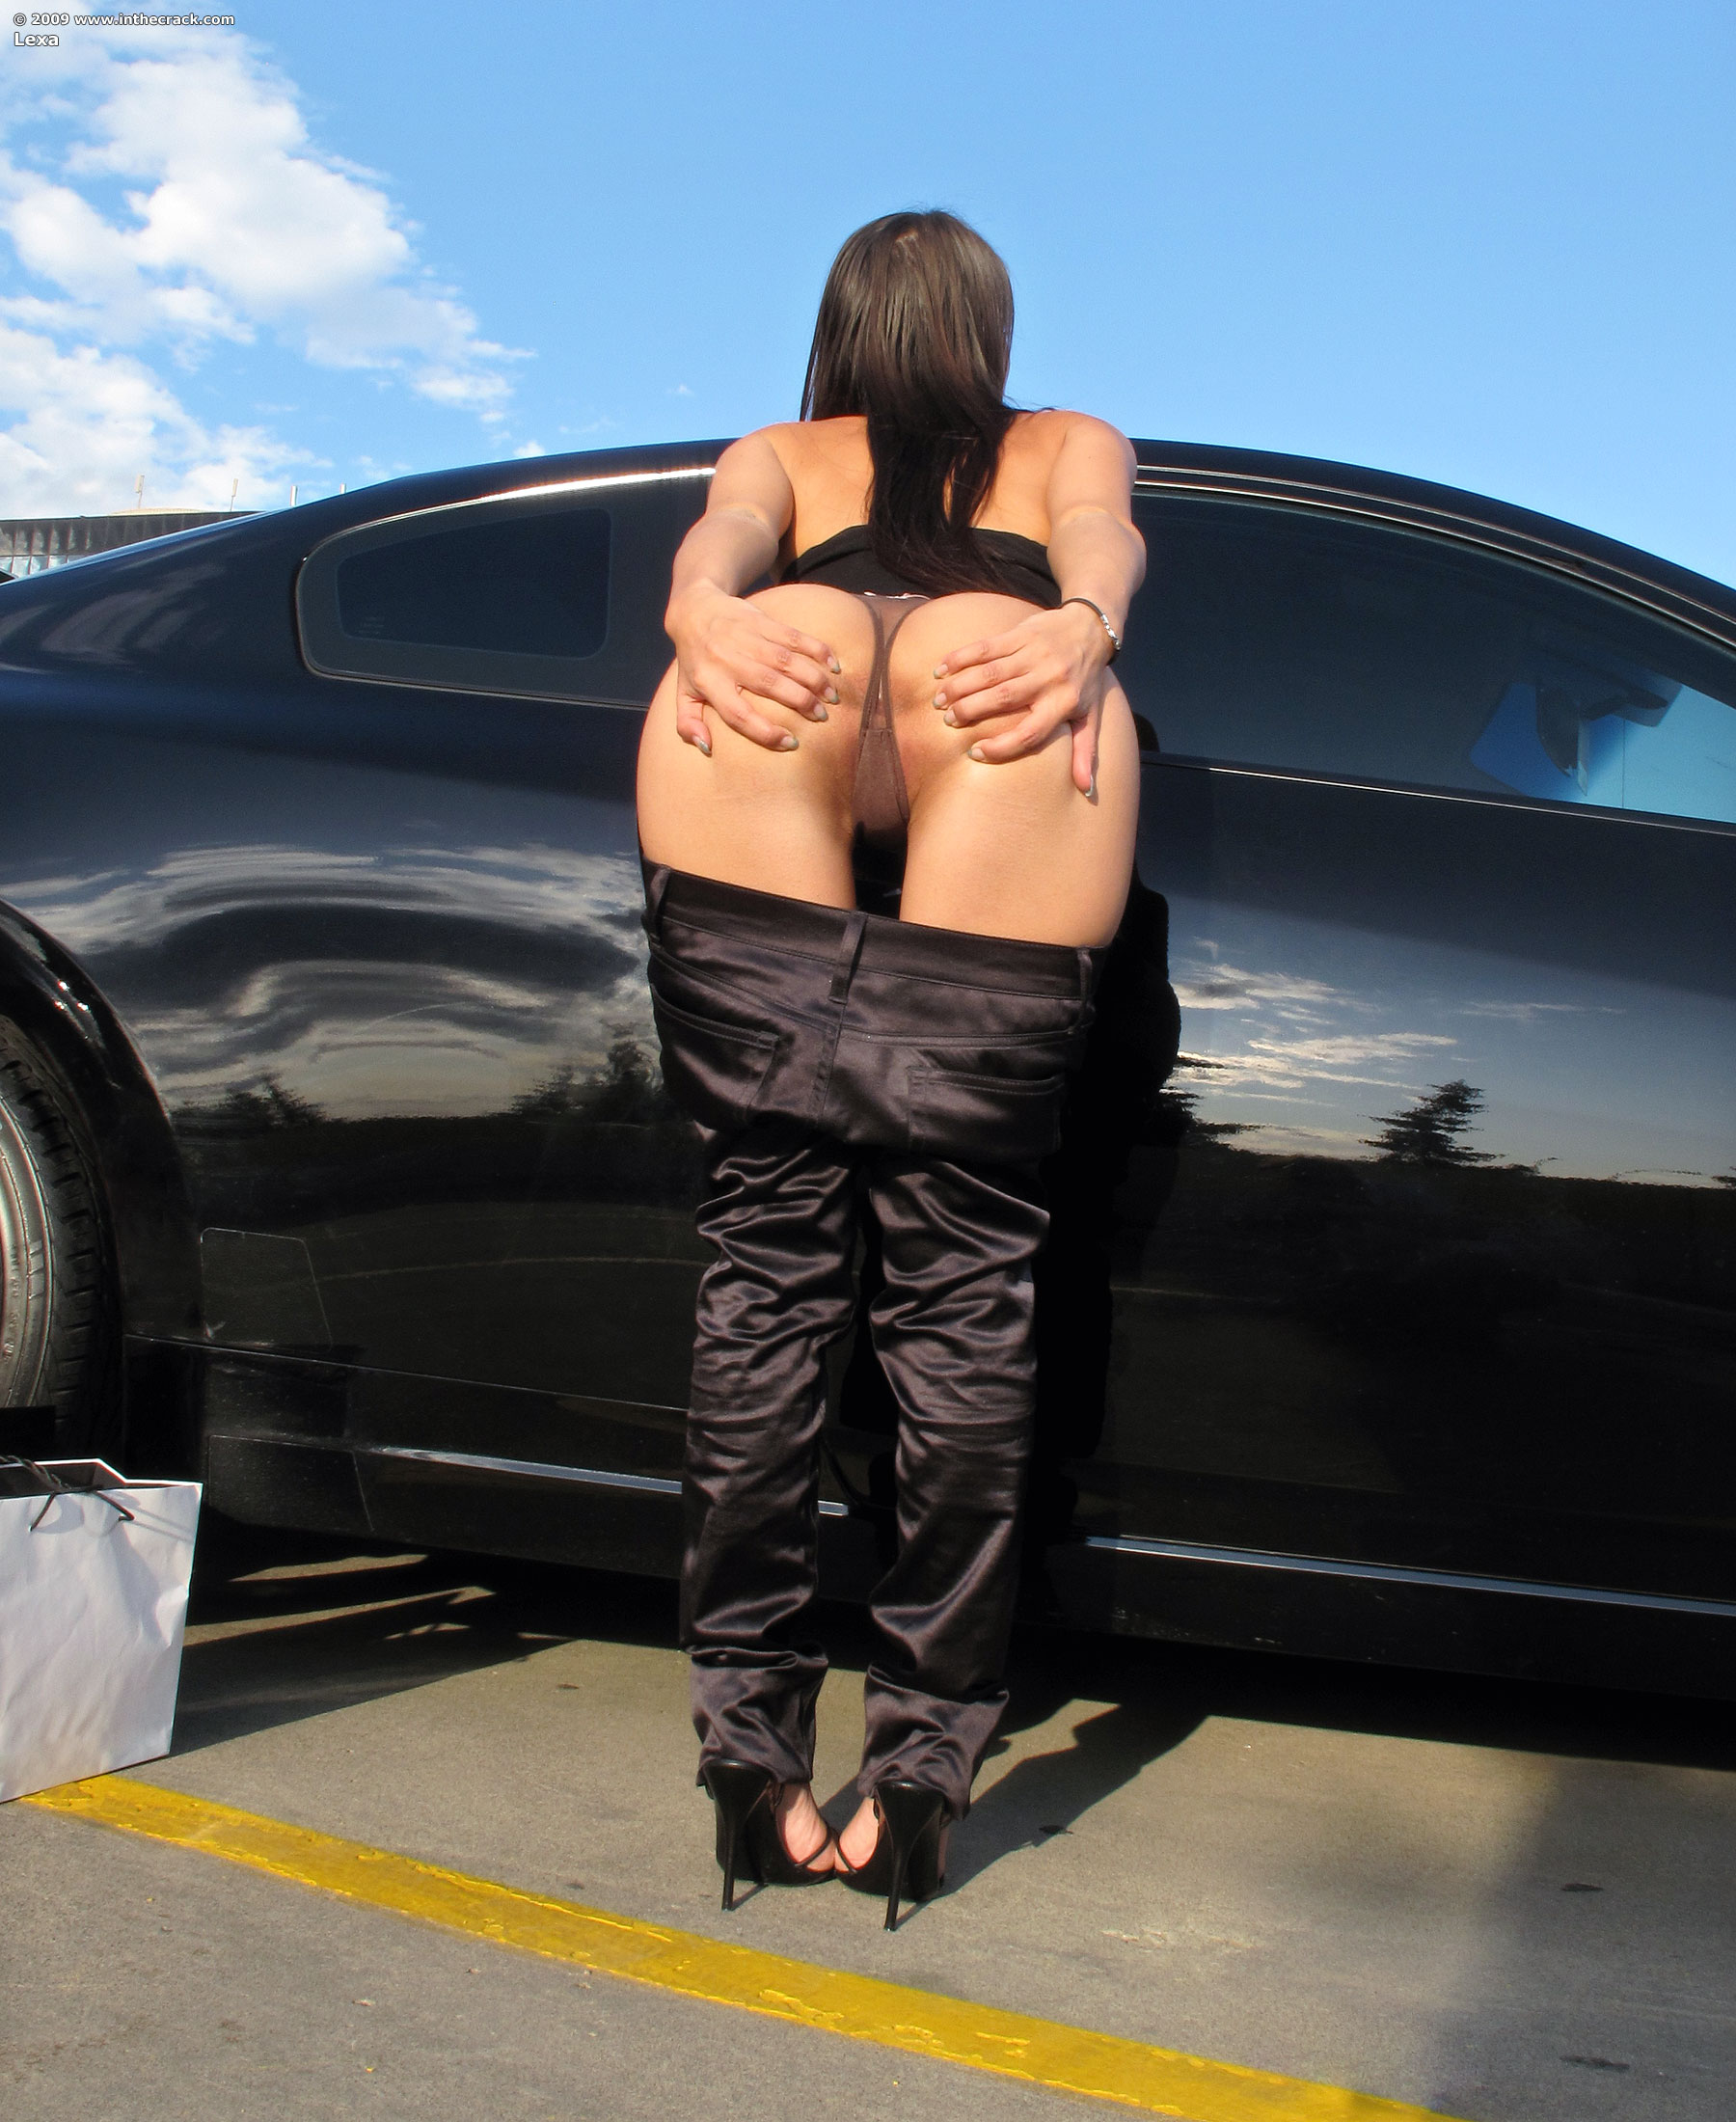 Necessary words... inthecrack lexa nude in car